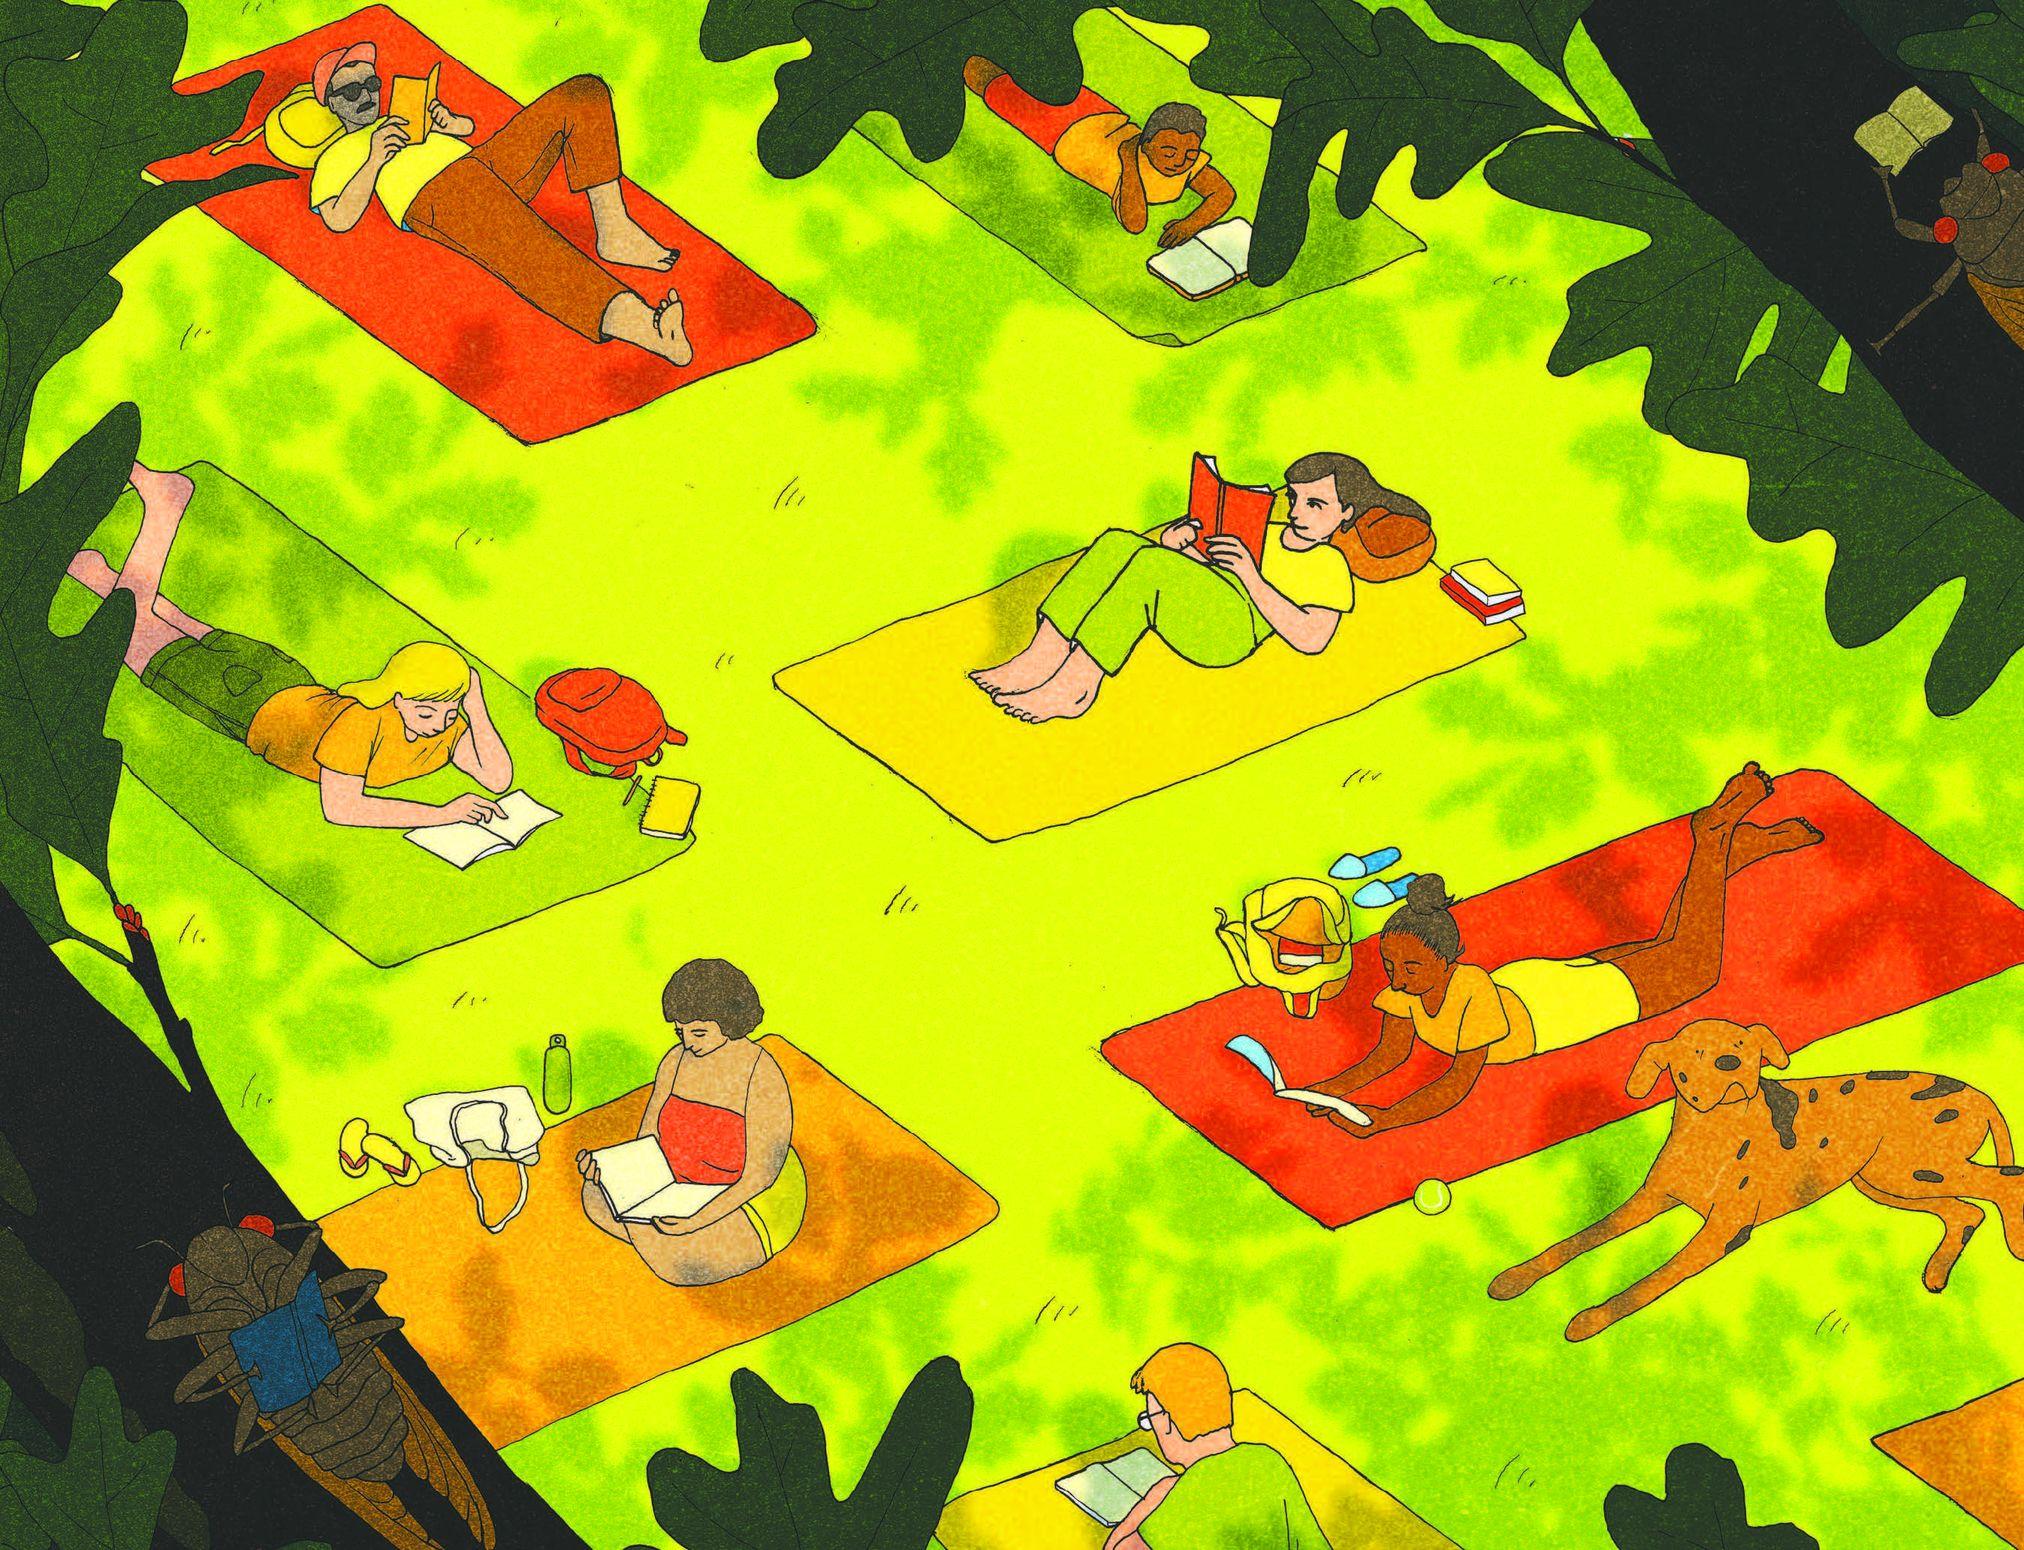 garance-illustration-Emma-Roulette-Washington-Post-Summer-Reads-1